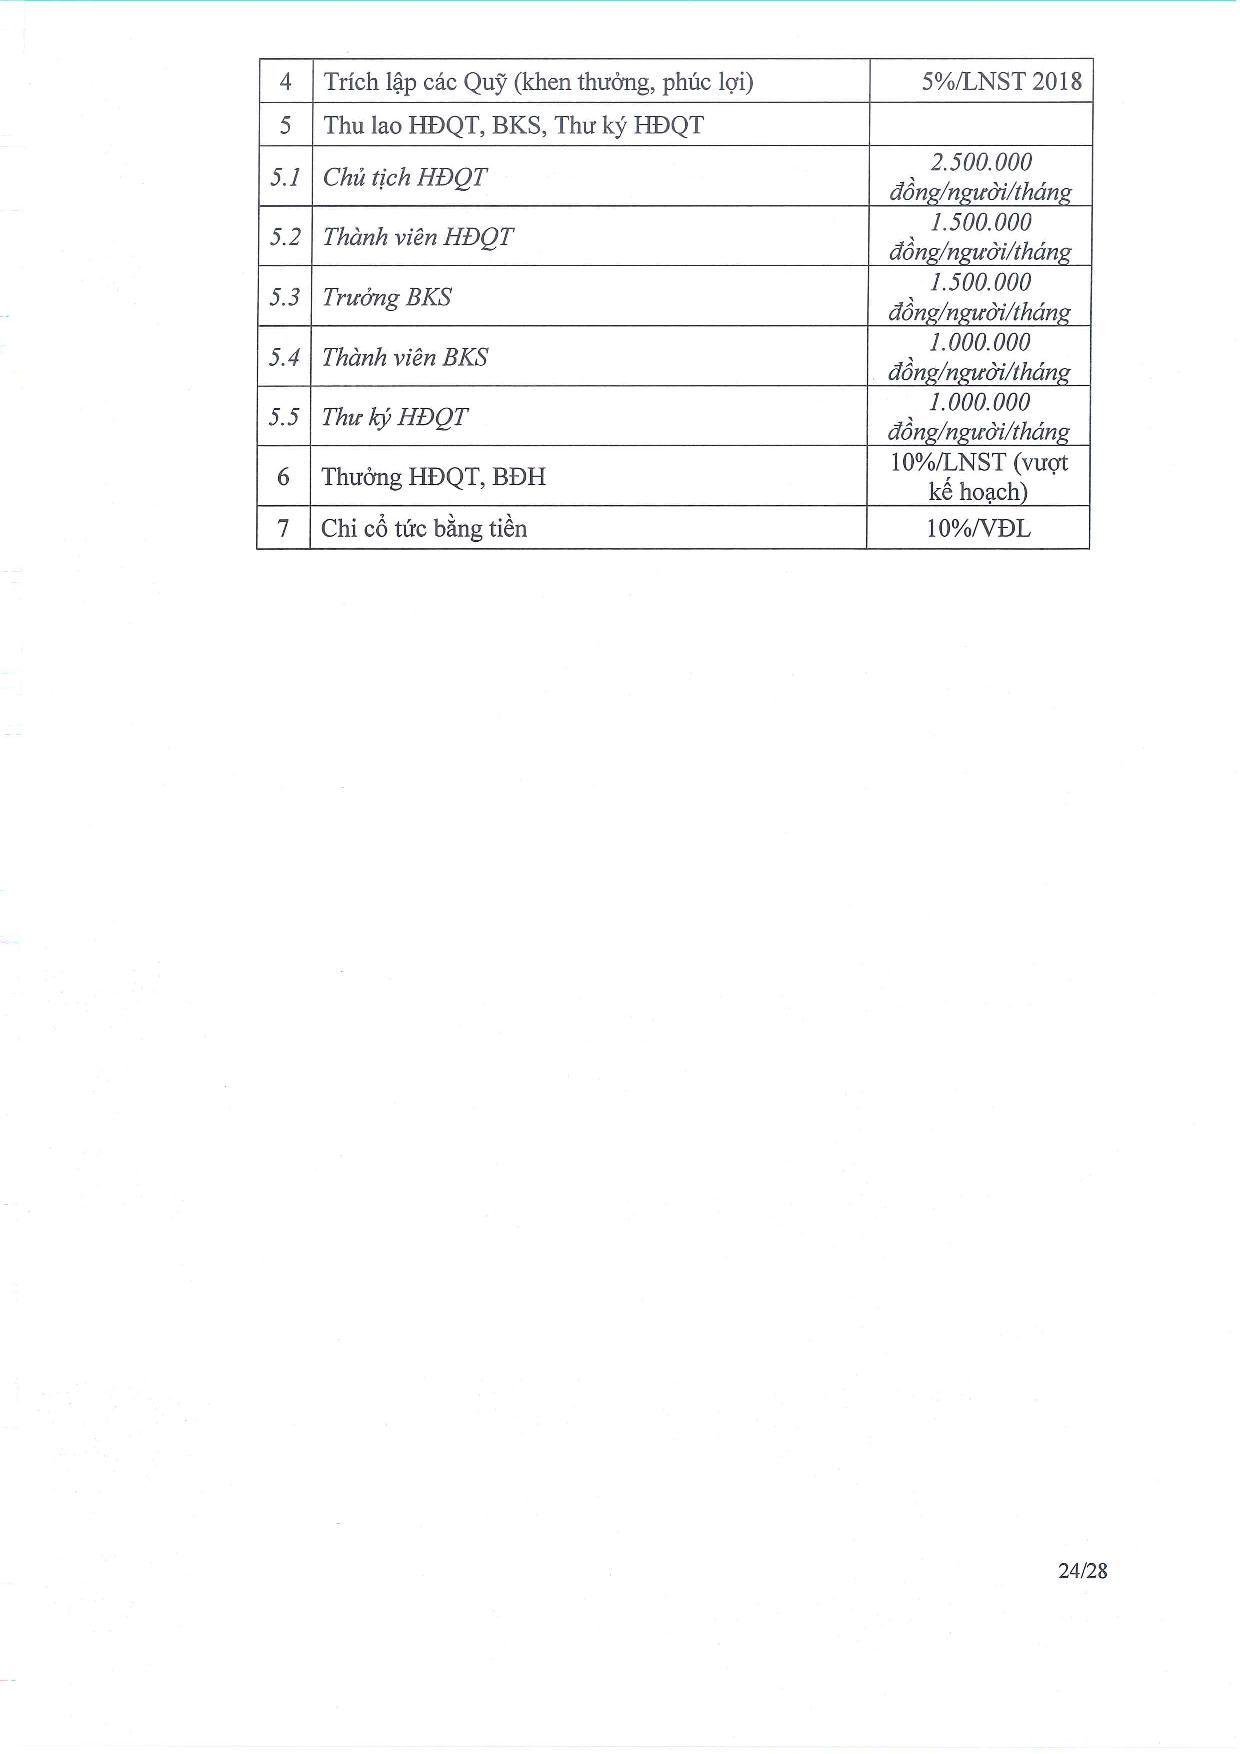 tai-lieu-dhcd-thuong-nien-2018-page (24)